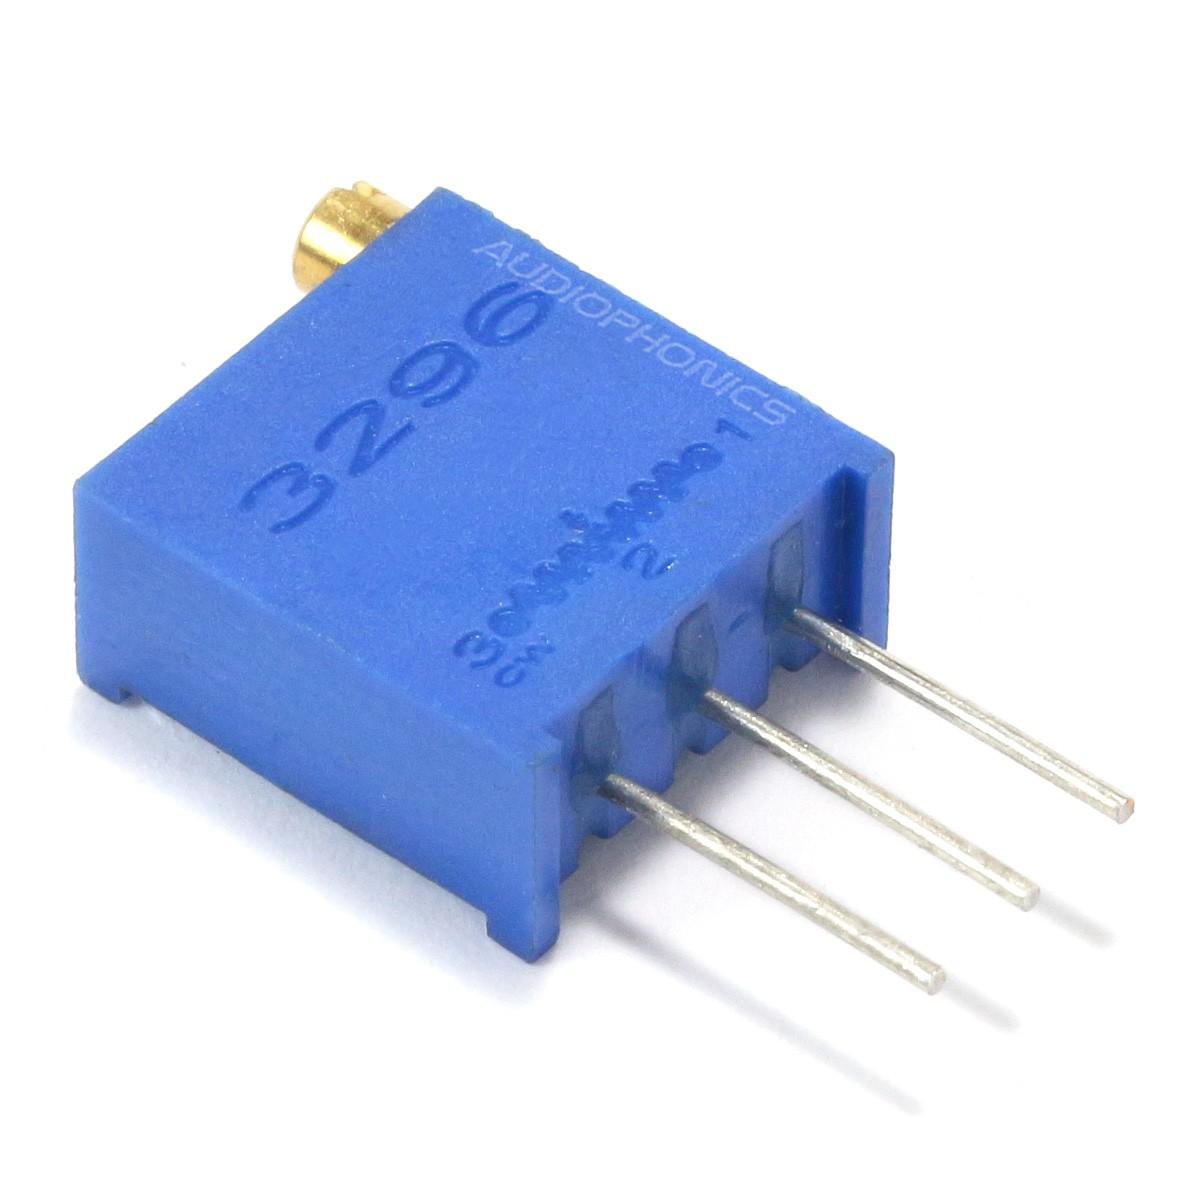 3296W-1-102 Multiturn Trimming Potentiometer 1K Ohm